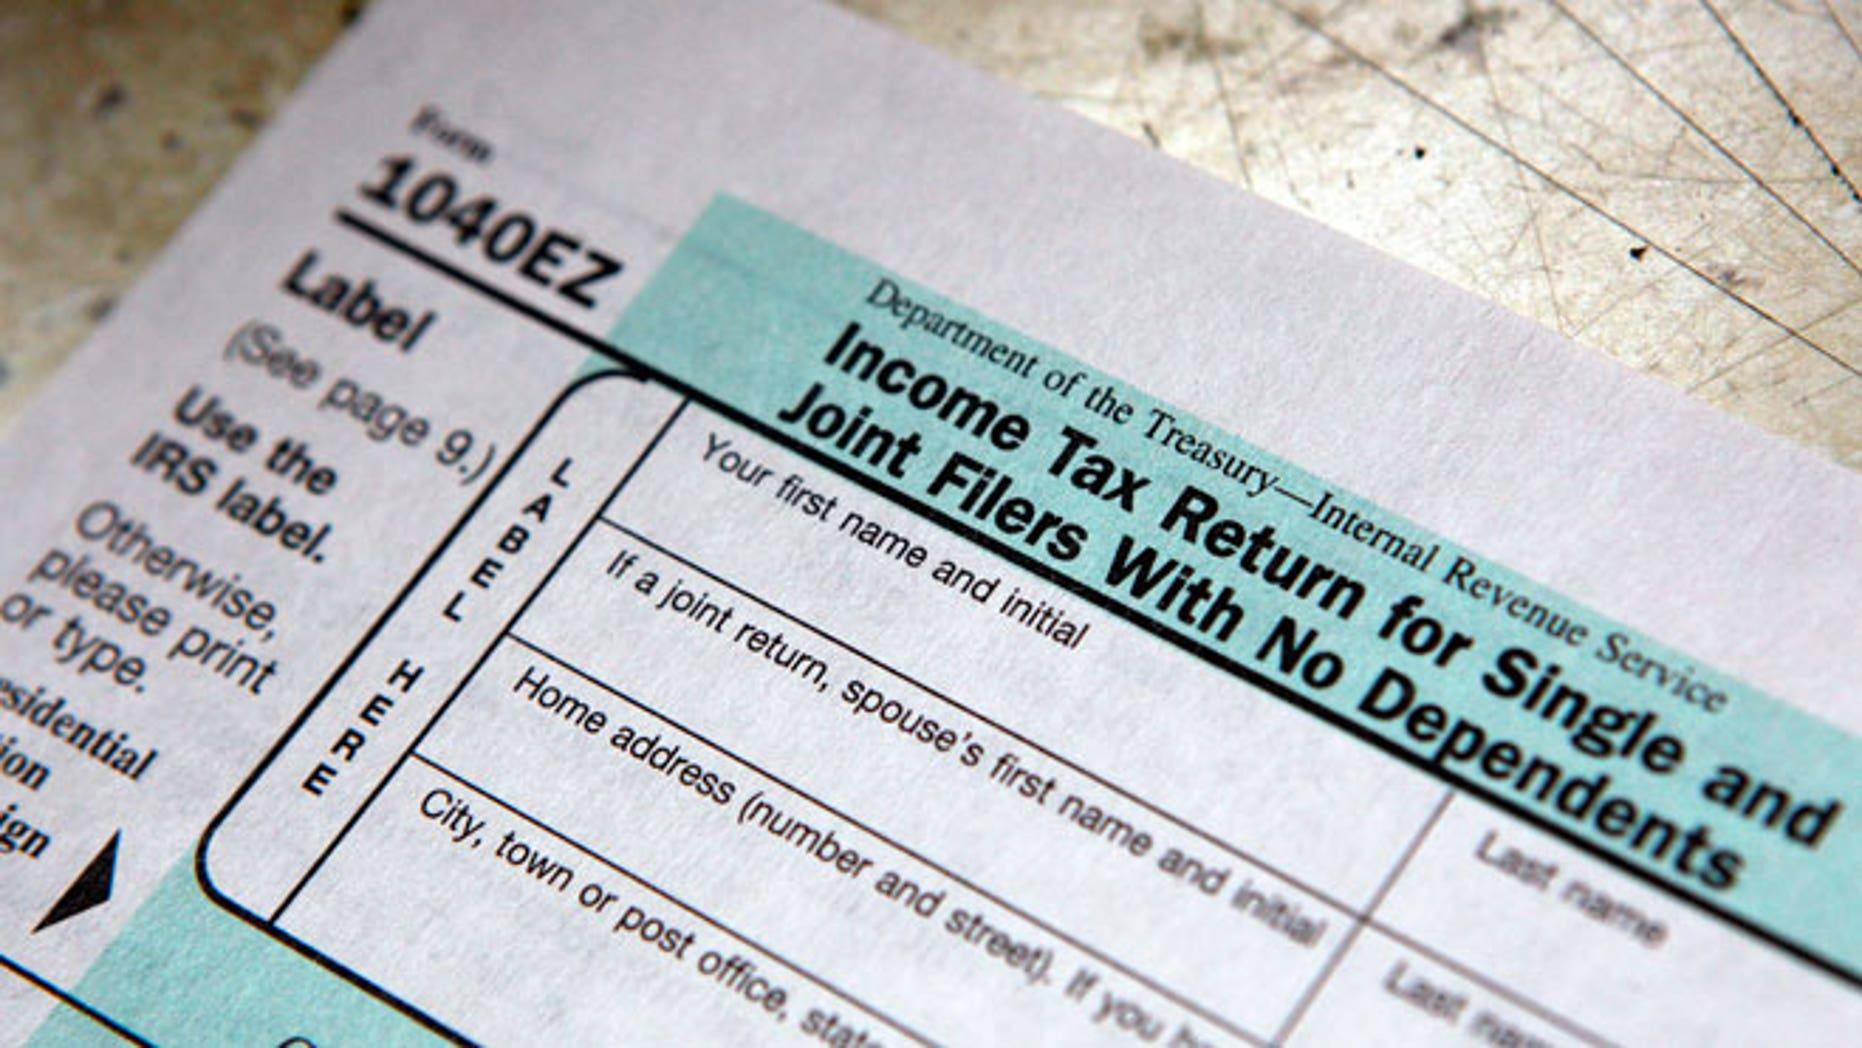 Westlake Legal Group 1040EZ-taxes 4 places to look for your unclaimed money The Kim Komando Show Kim Komando fox-news/tech fnc/tech fnc article 0ad0386f-7a24-5c8a-8138-16e4fe09804a